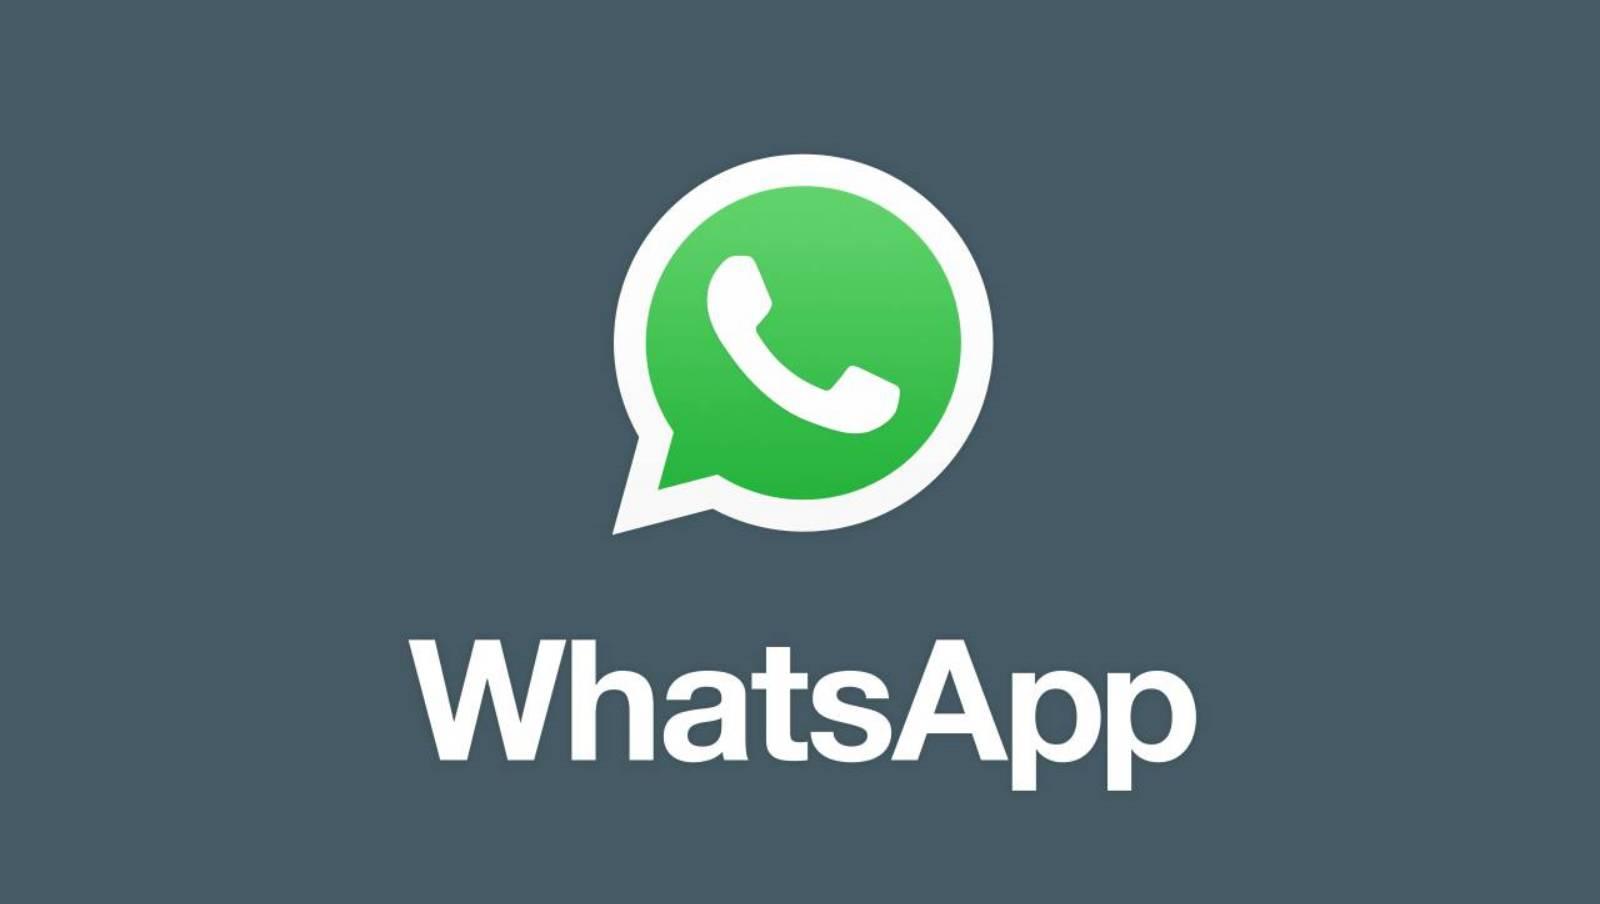 WhatsApp germani